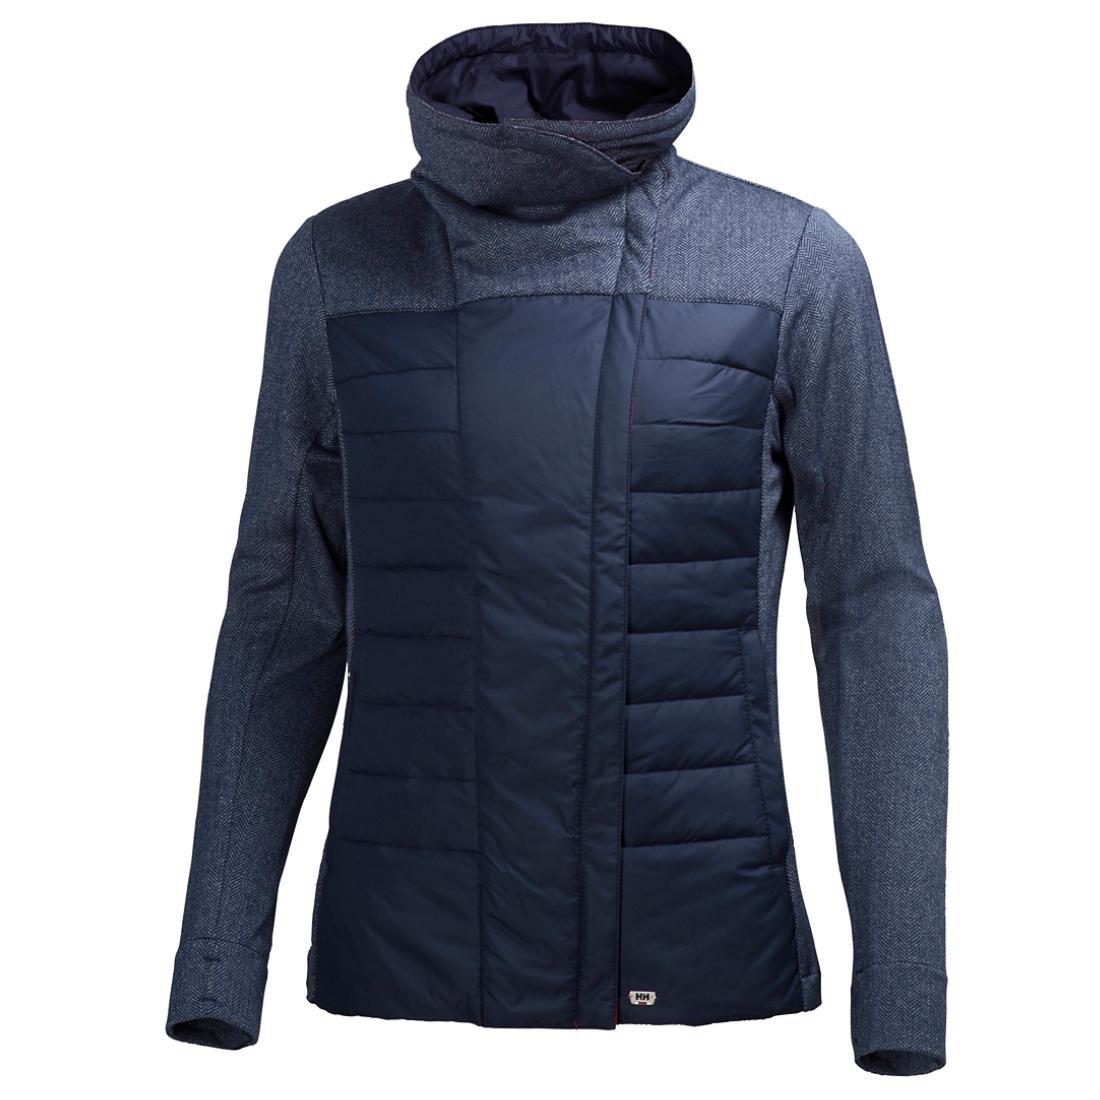 Helly Hansen Damen Jacke W Astra Jacket